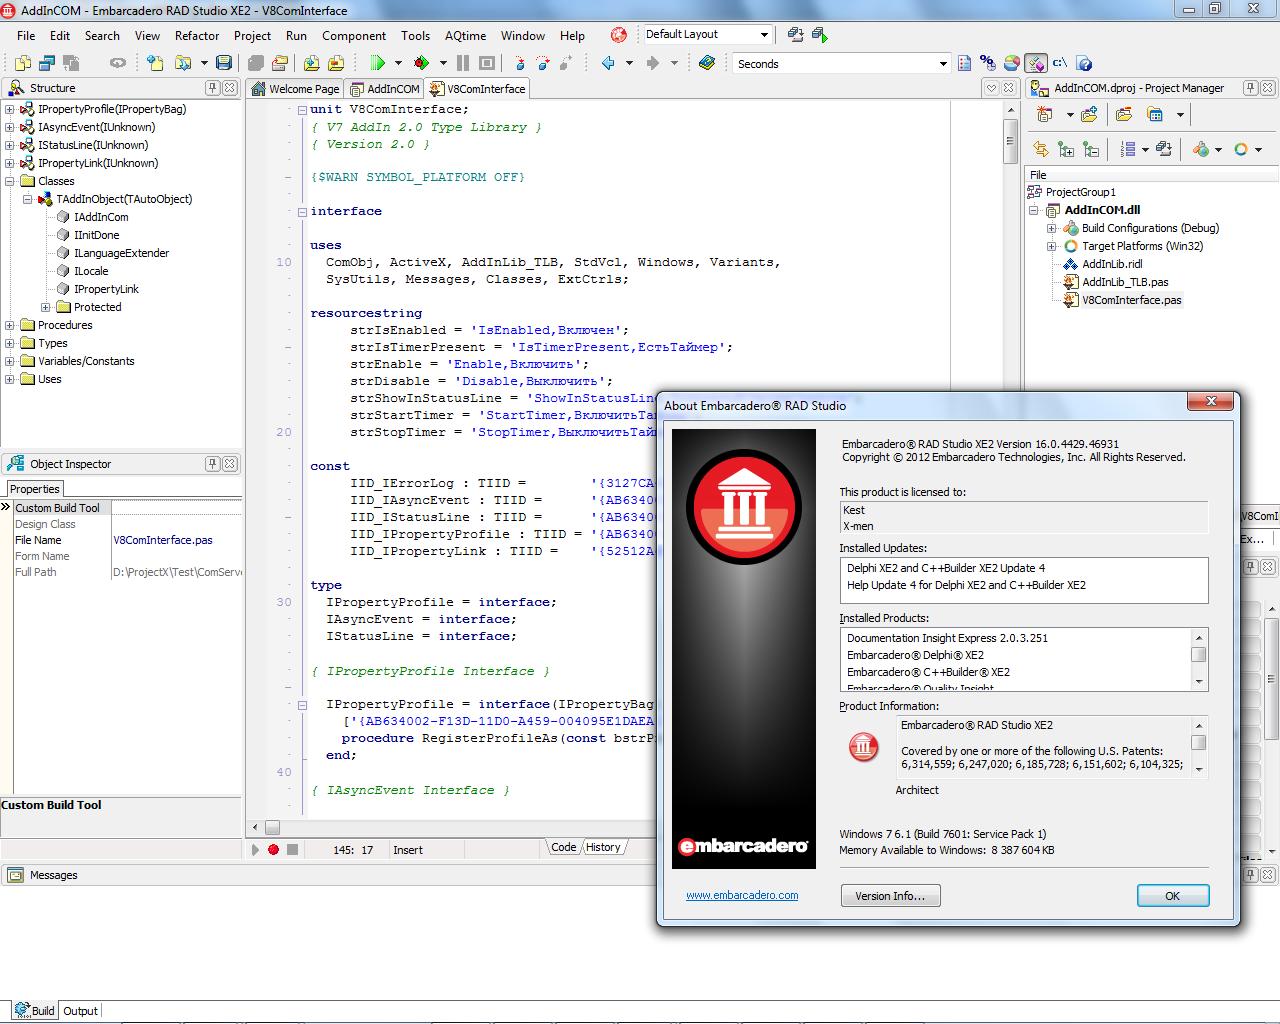 Пример файлов проекта в delphi xe2